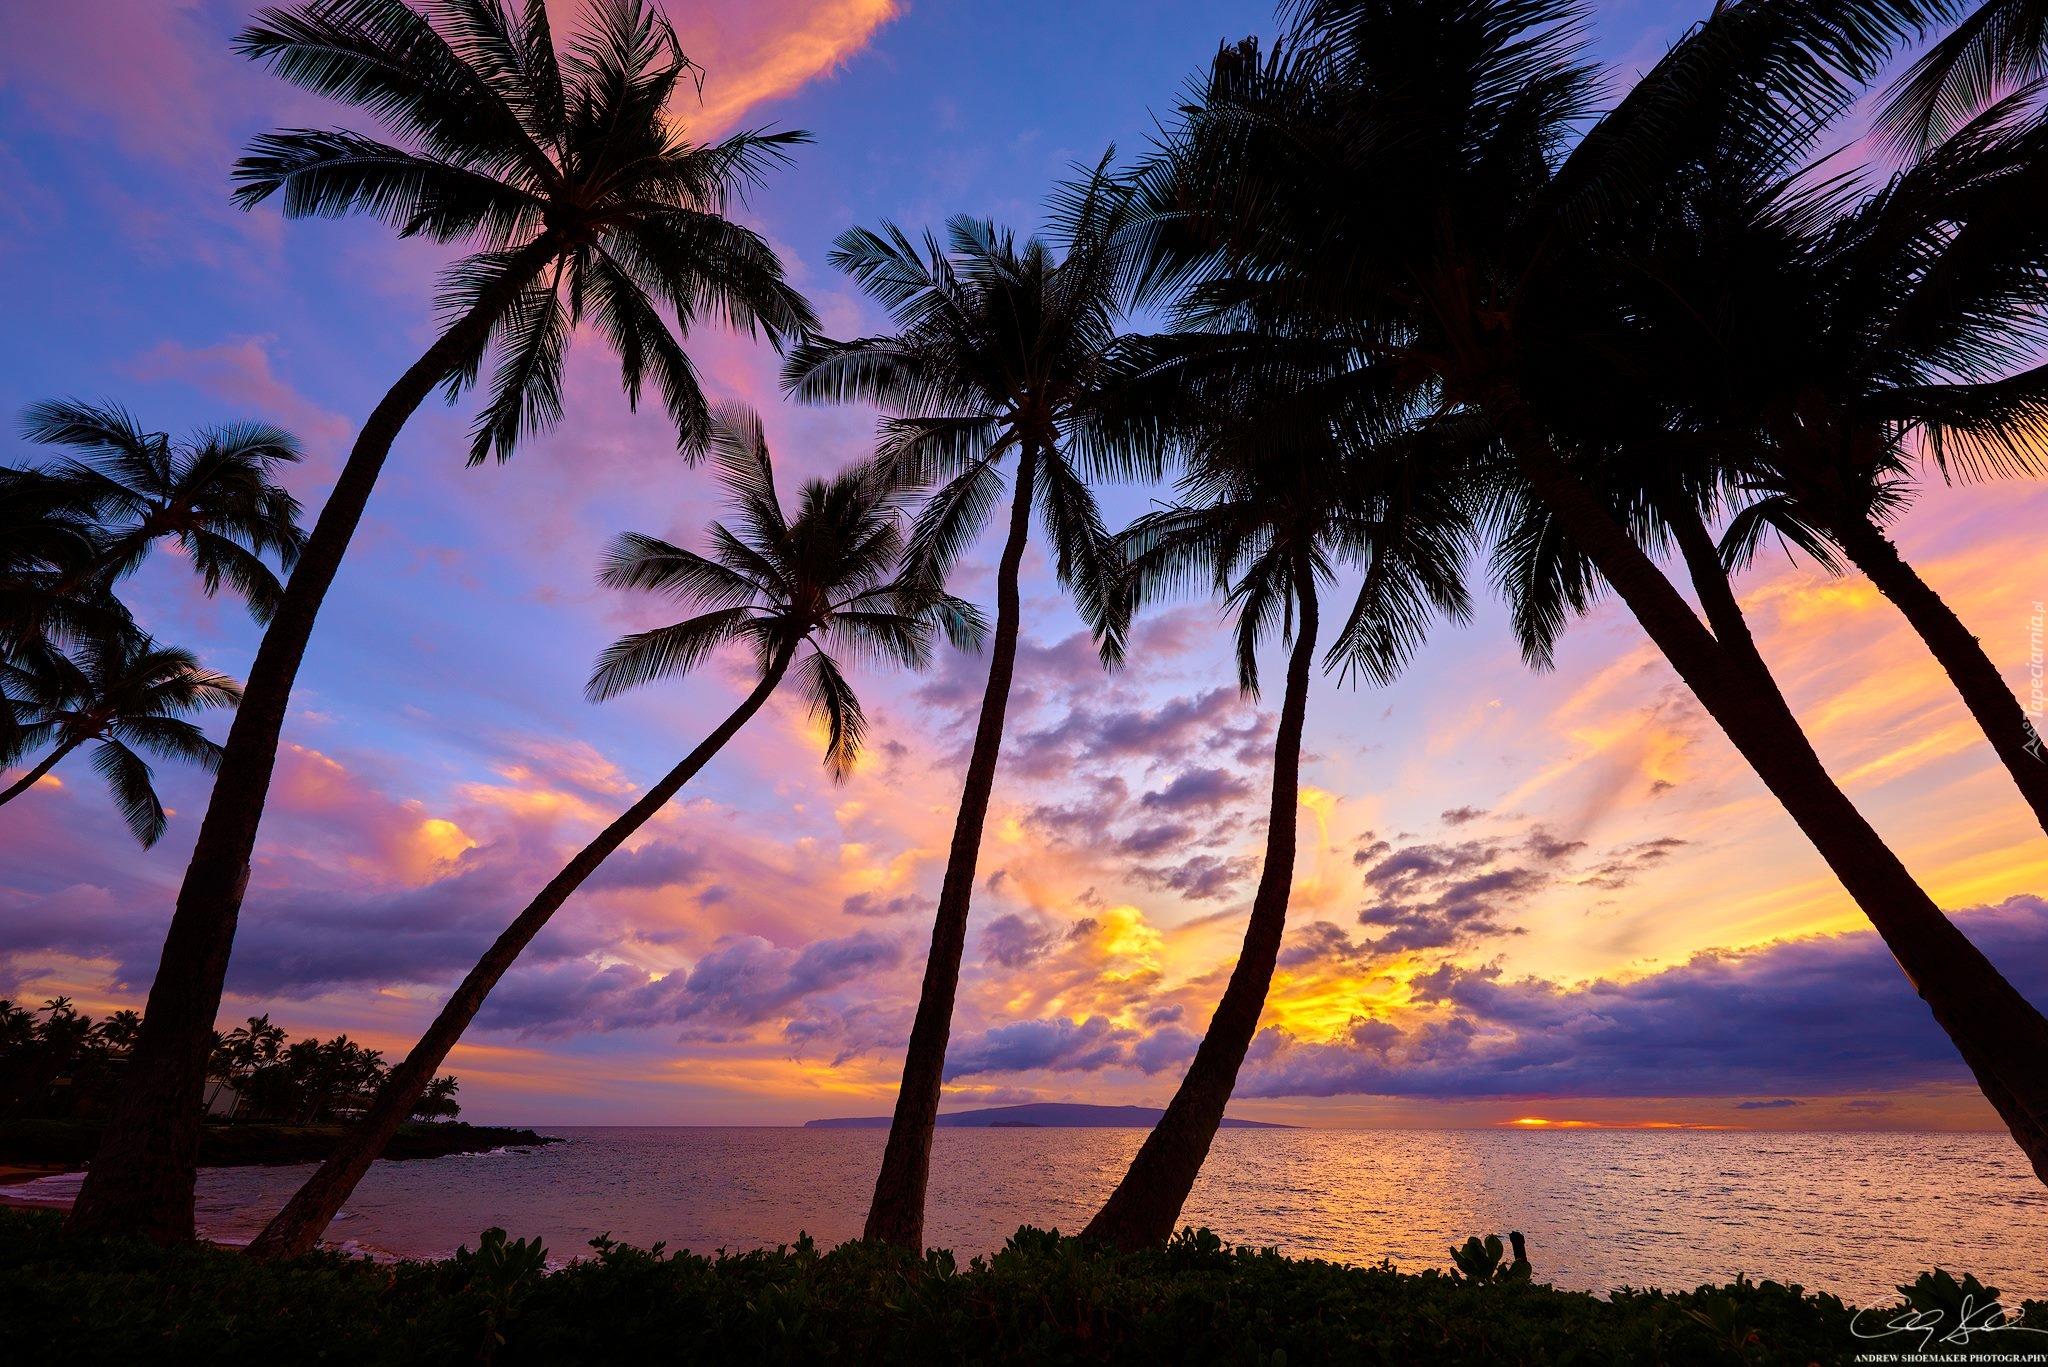 Tapeta Palmy Na Plazy Wailea W South Maui O Zachodzie Slonca on Wailea Beach Maui